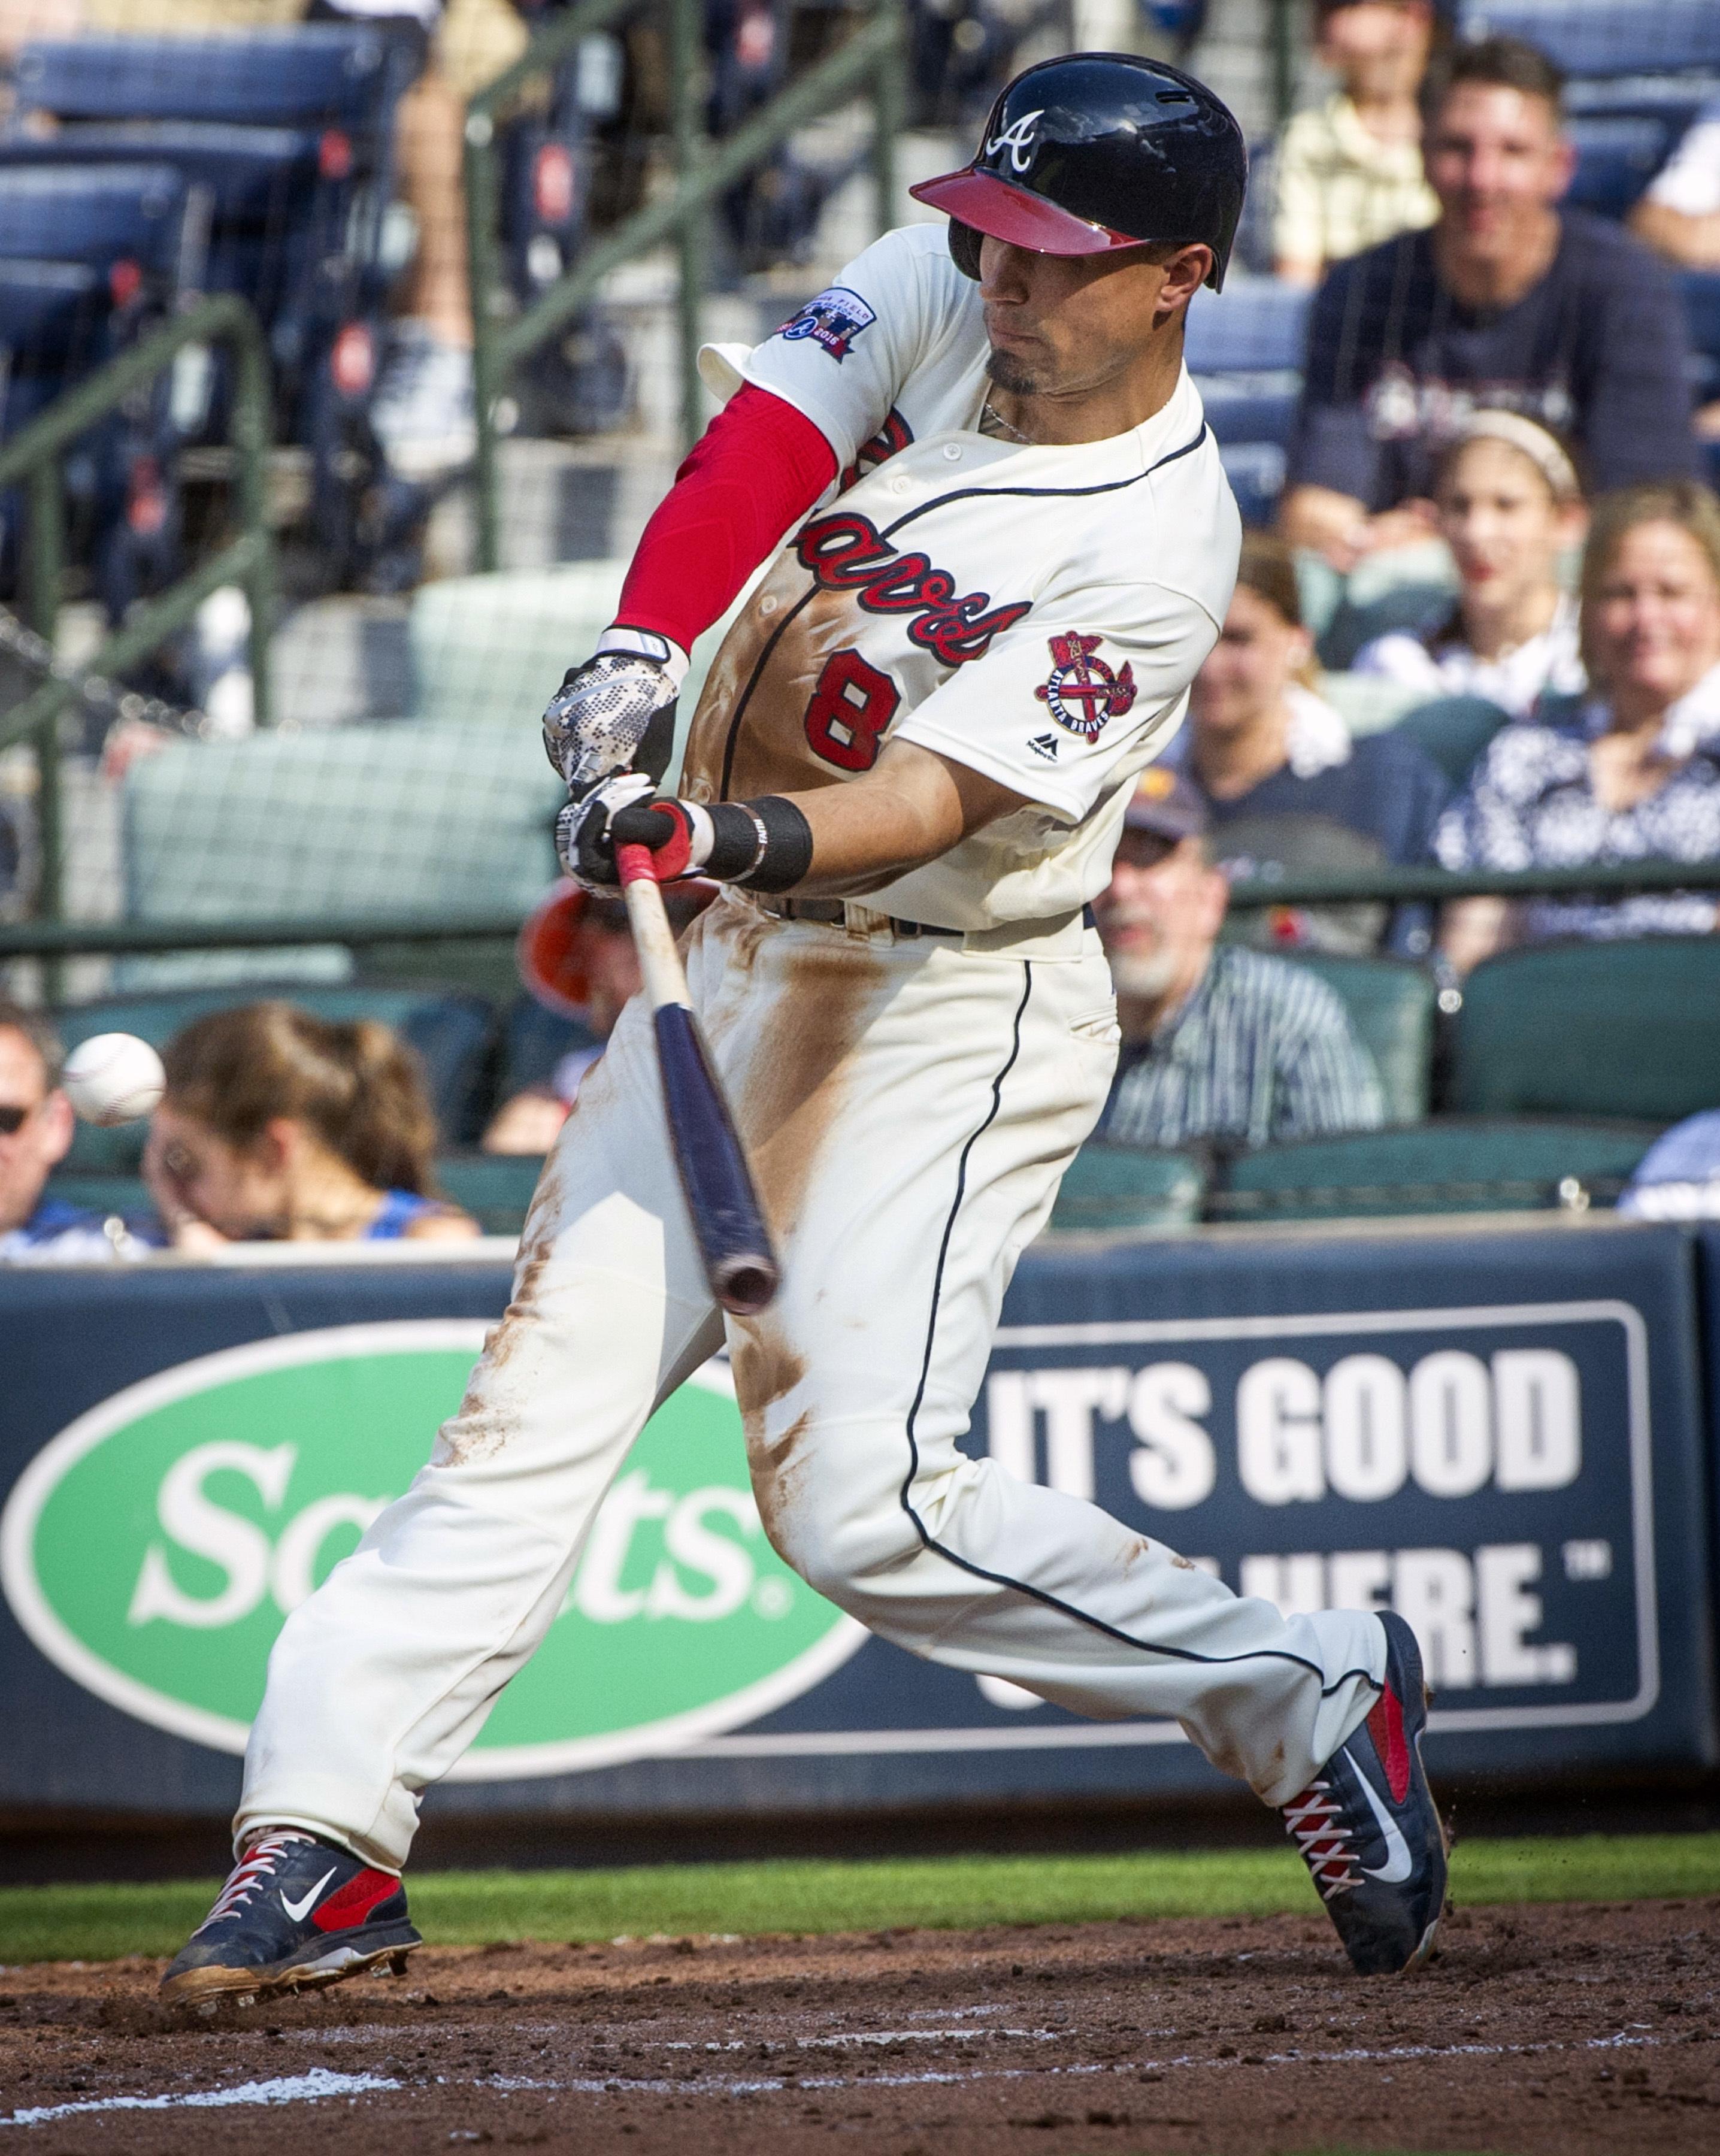 Atlanta Braves' Jace Peterson hits a three-run home run to right field during the sixth inning of a baseball game against the Miami Marlins, Saturday, July 2, 2016, in Atlanta. (AP Photo/John Amis)